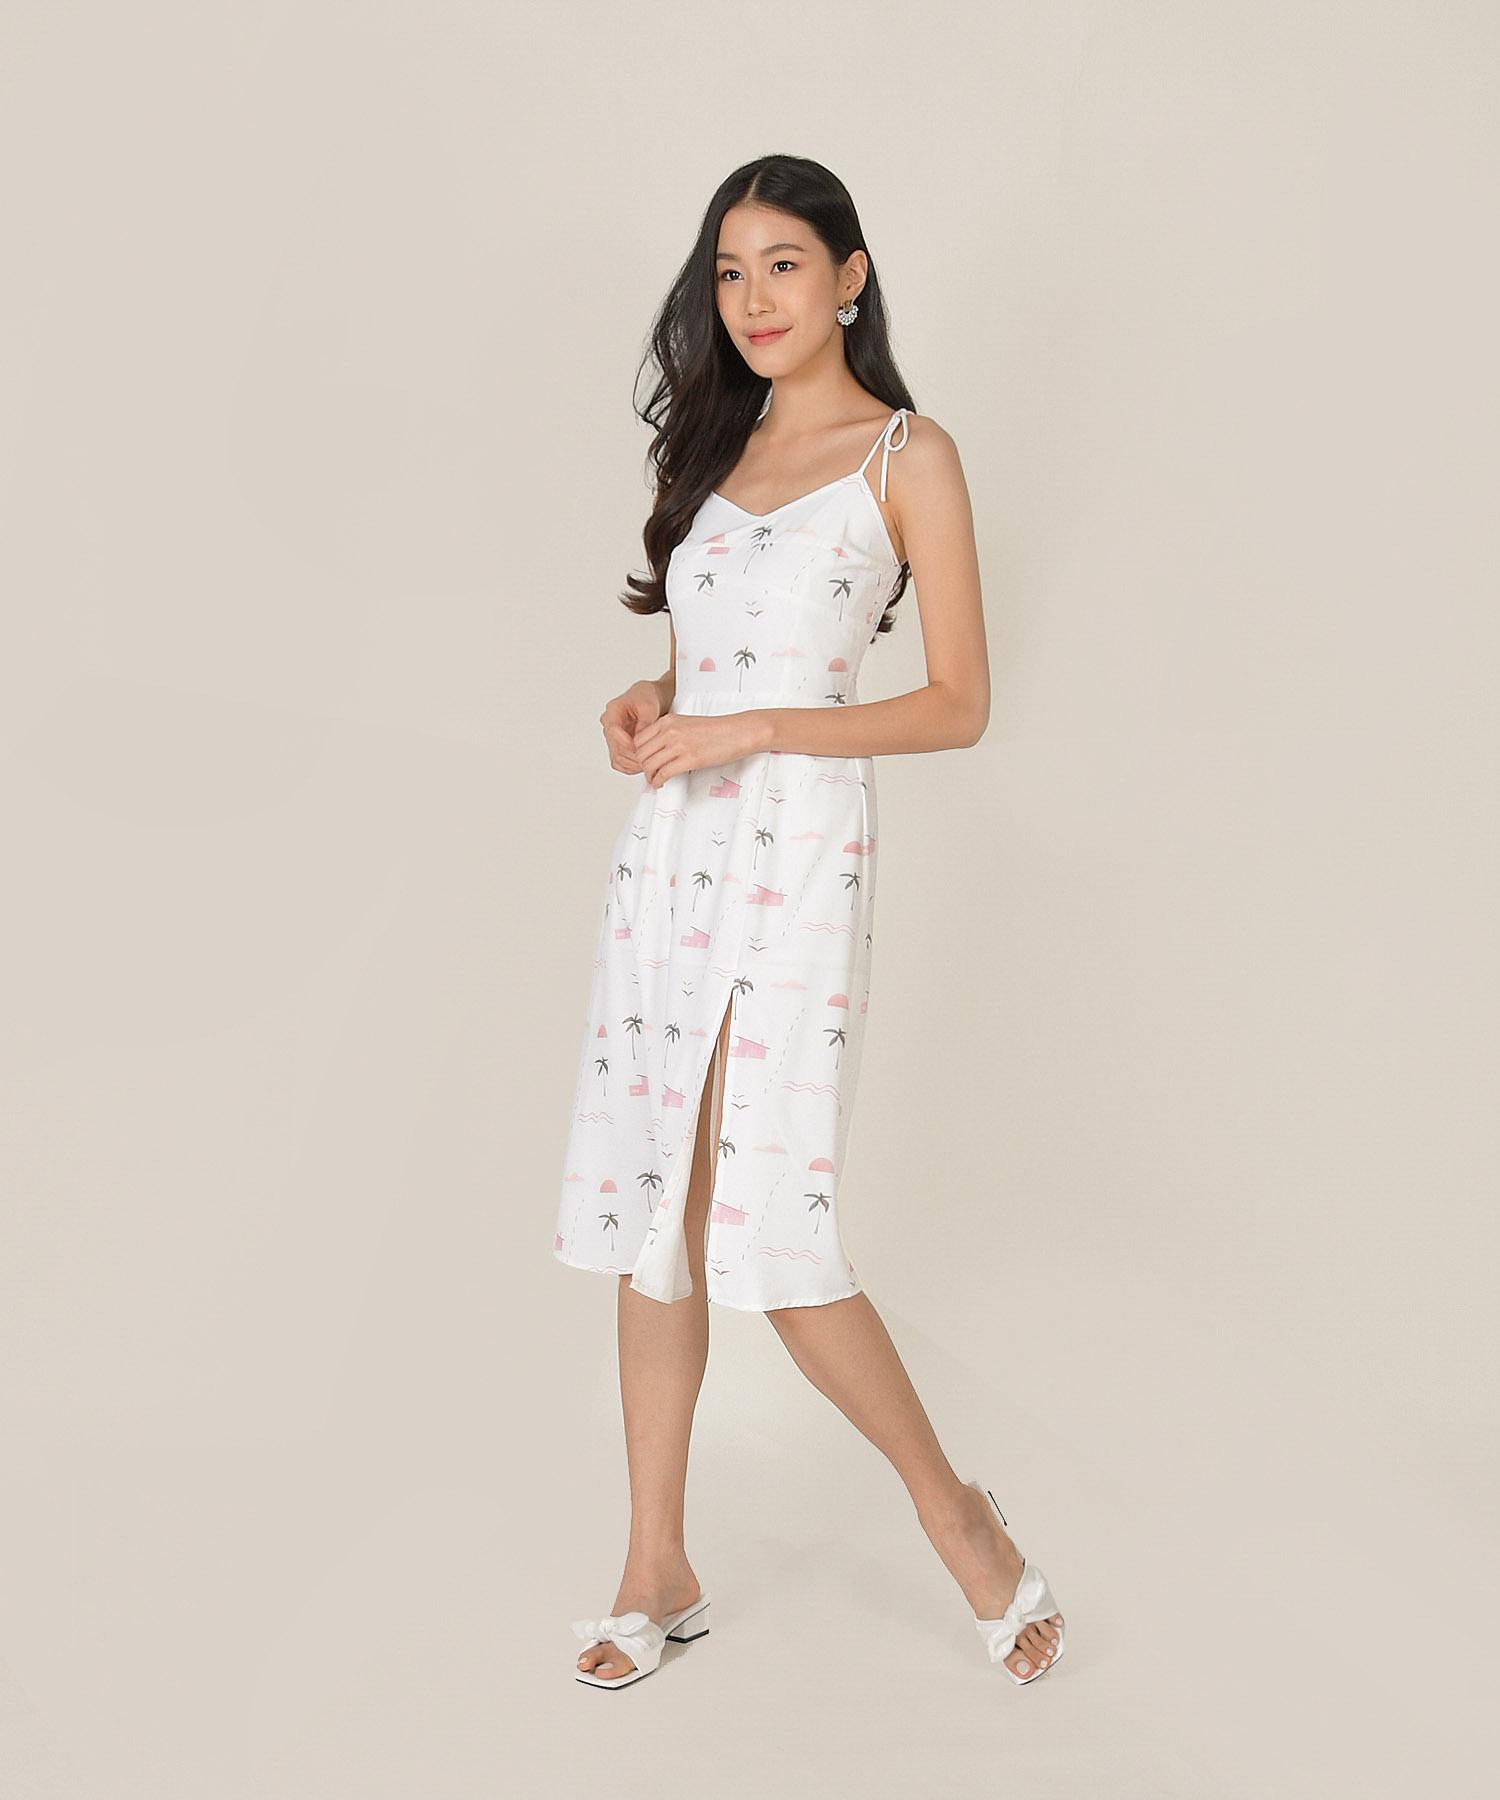 seville-slit-midi-dress-white-1